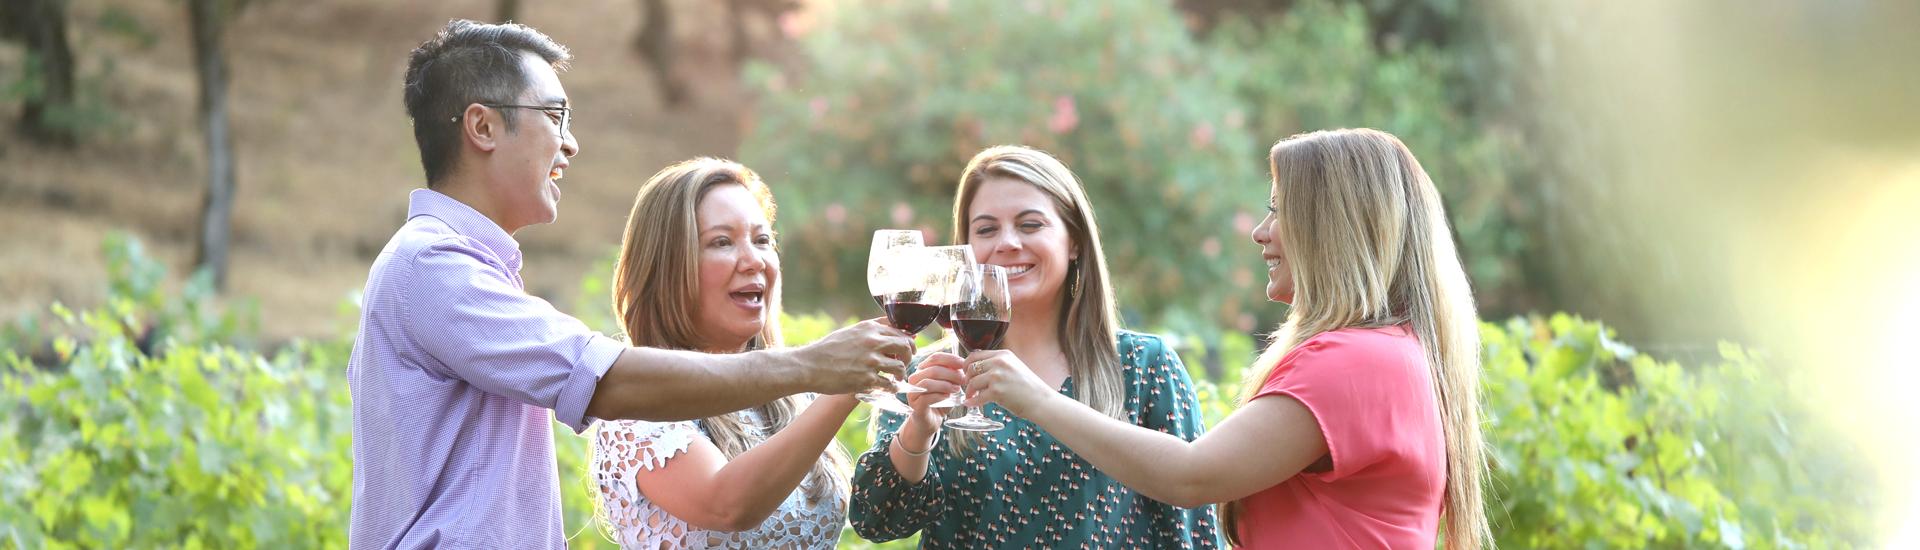 large group wine tasting napa valley